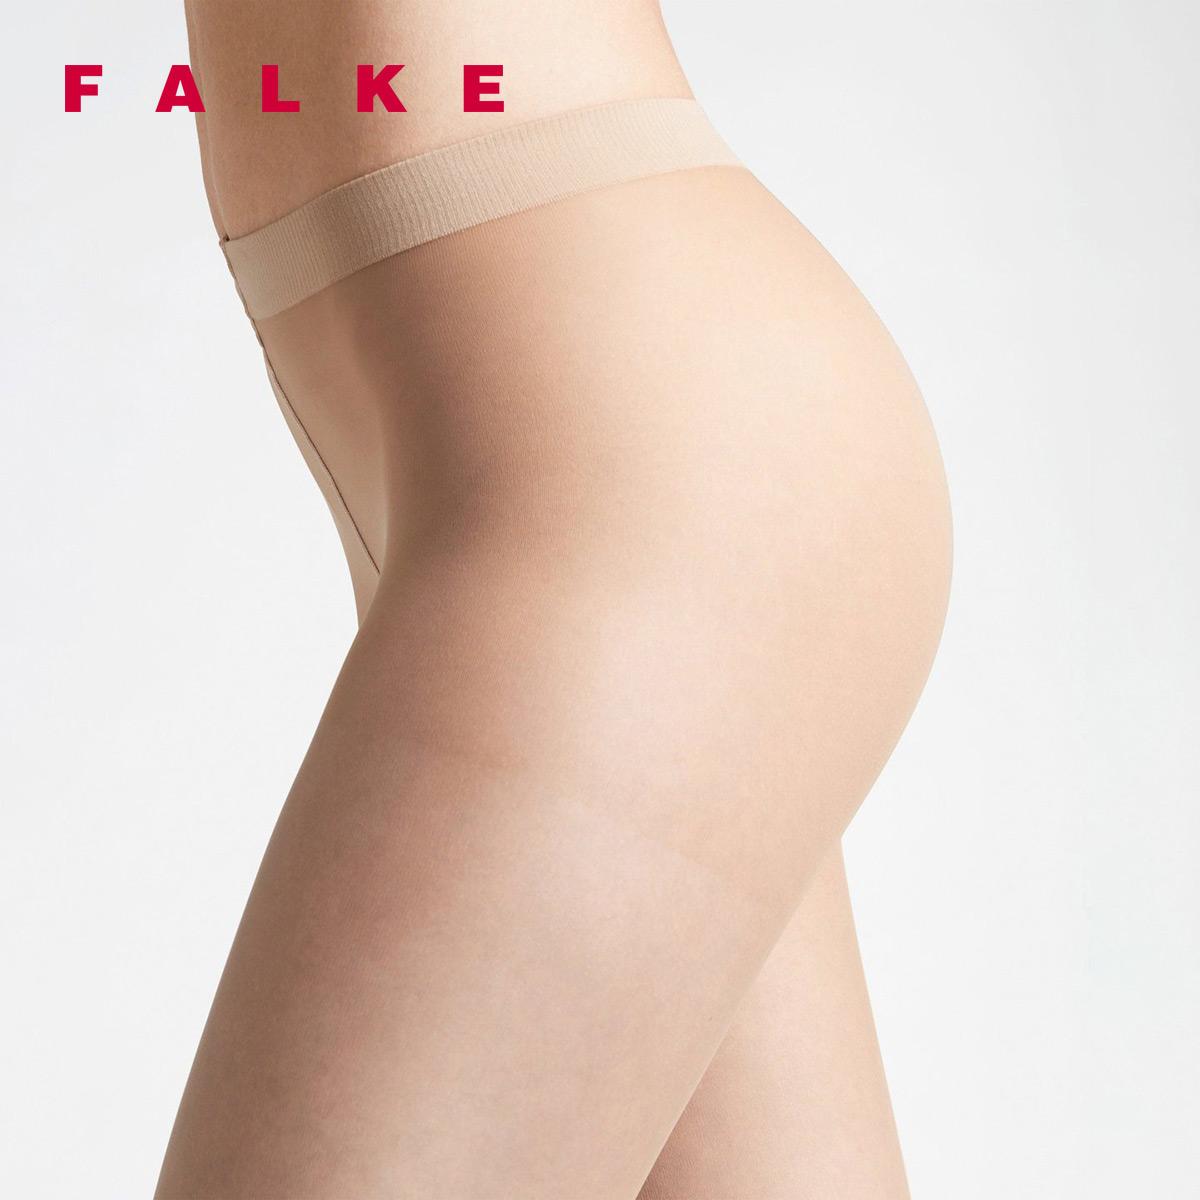 FALKE德国鹰客Invisible Deluxe 8D超薄透明哑光连裤丝袜女40610